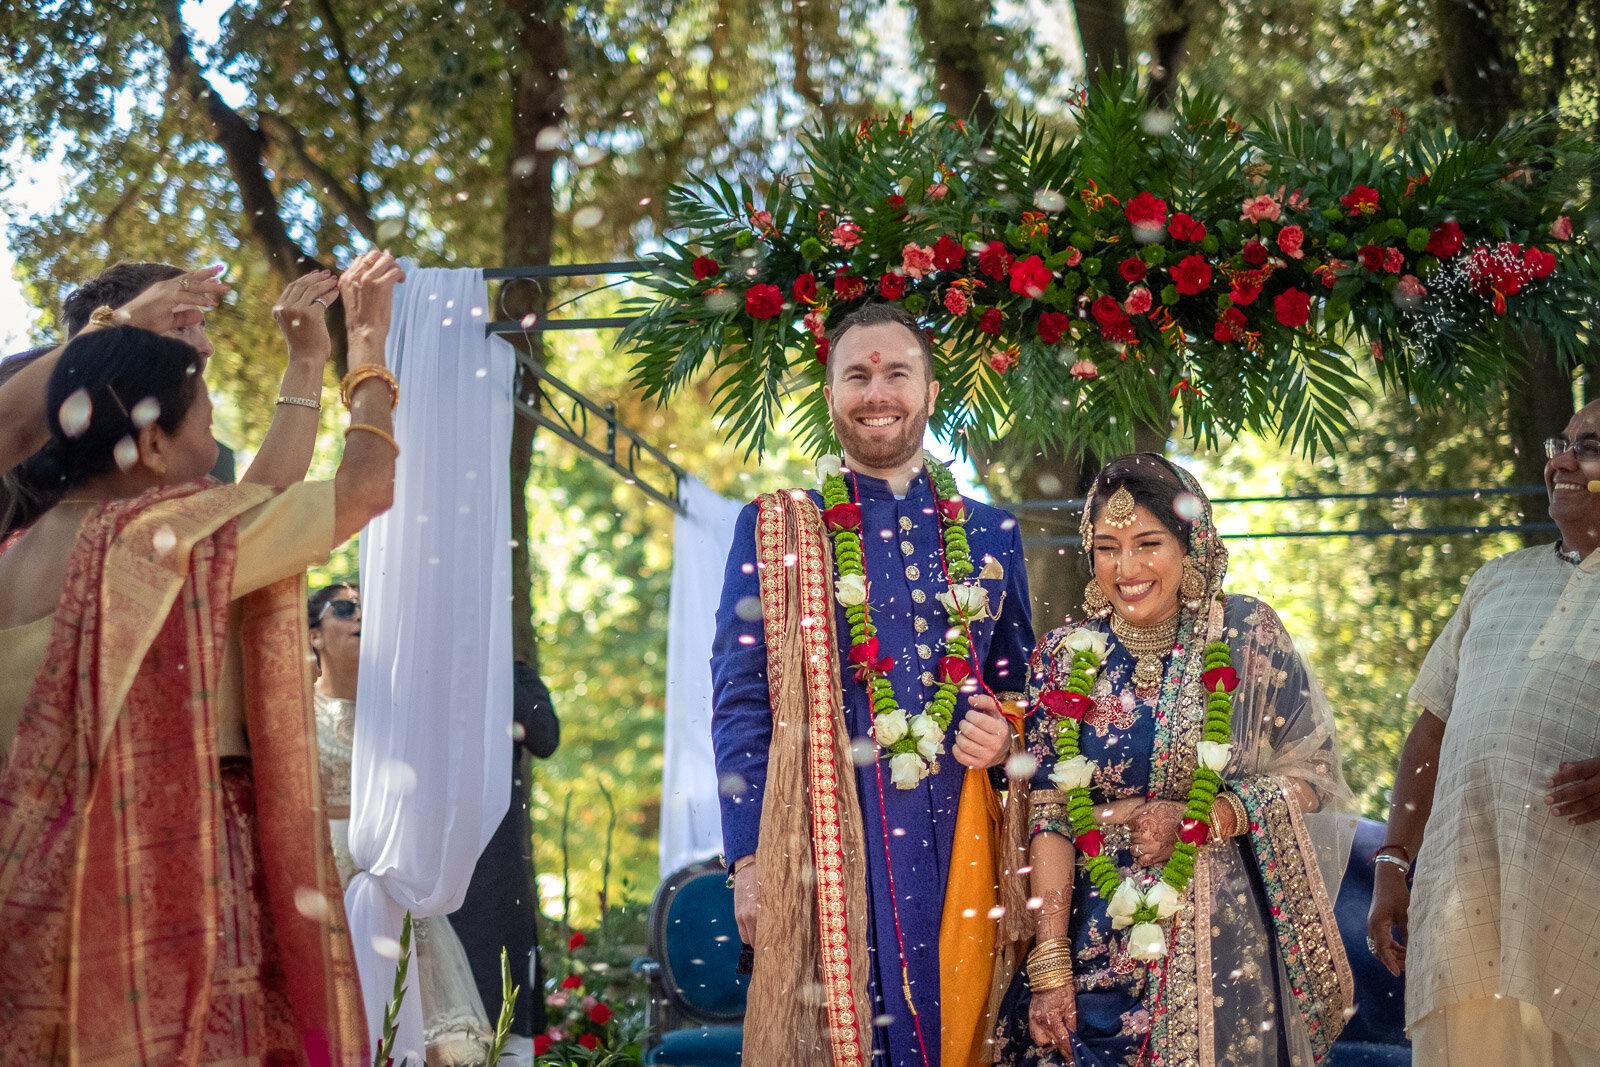 Destination Indian Wedding in Borgo San Faustino 22.jpg